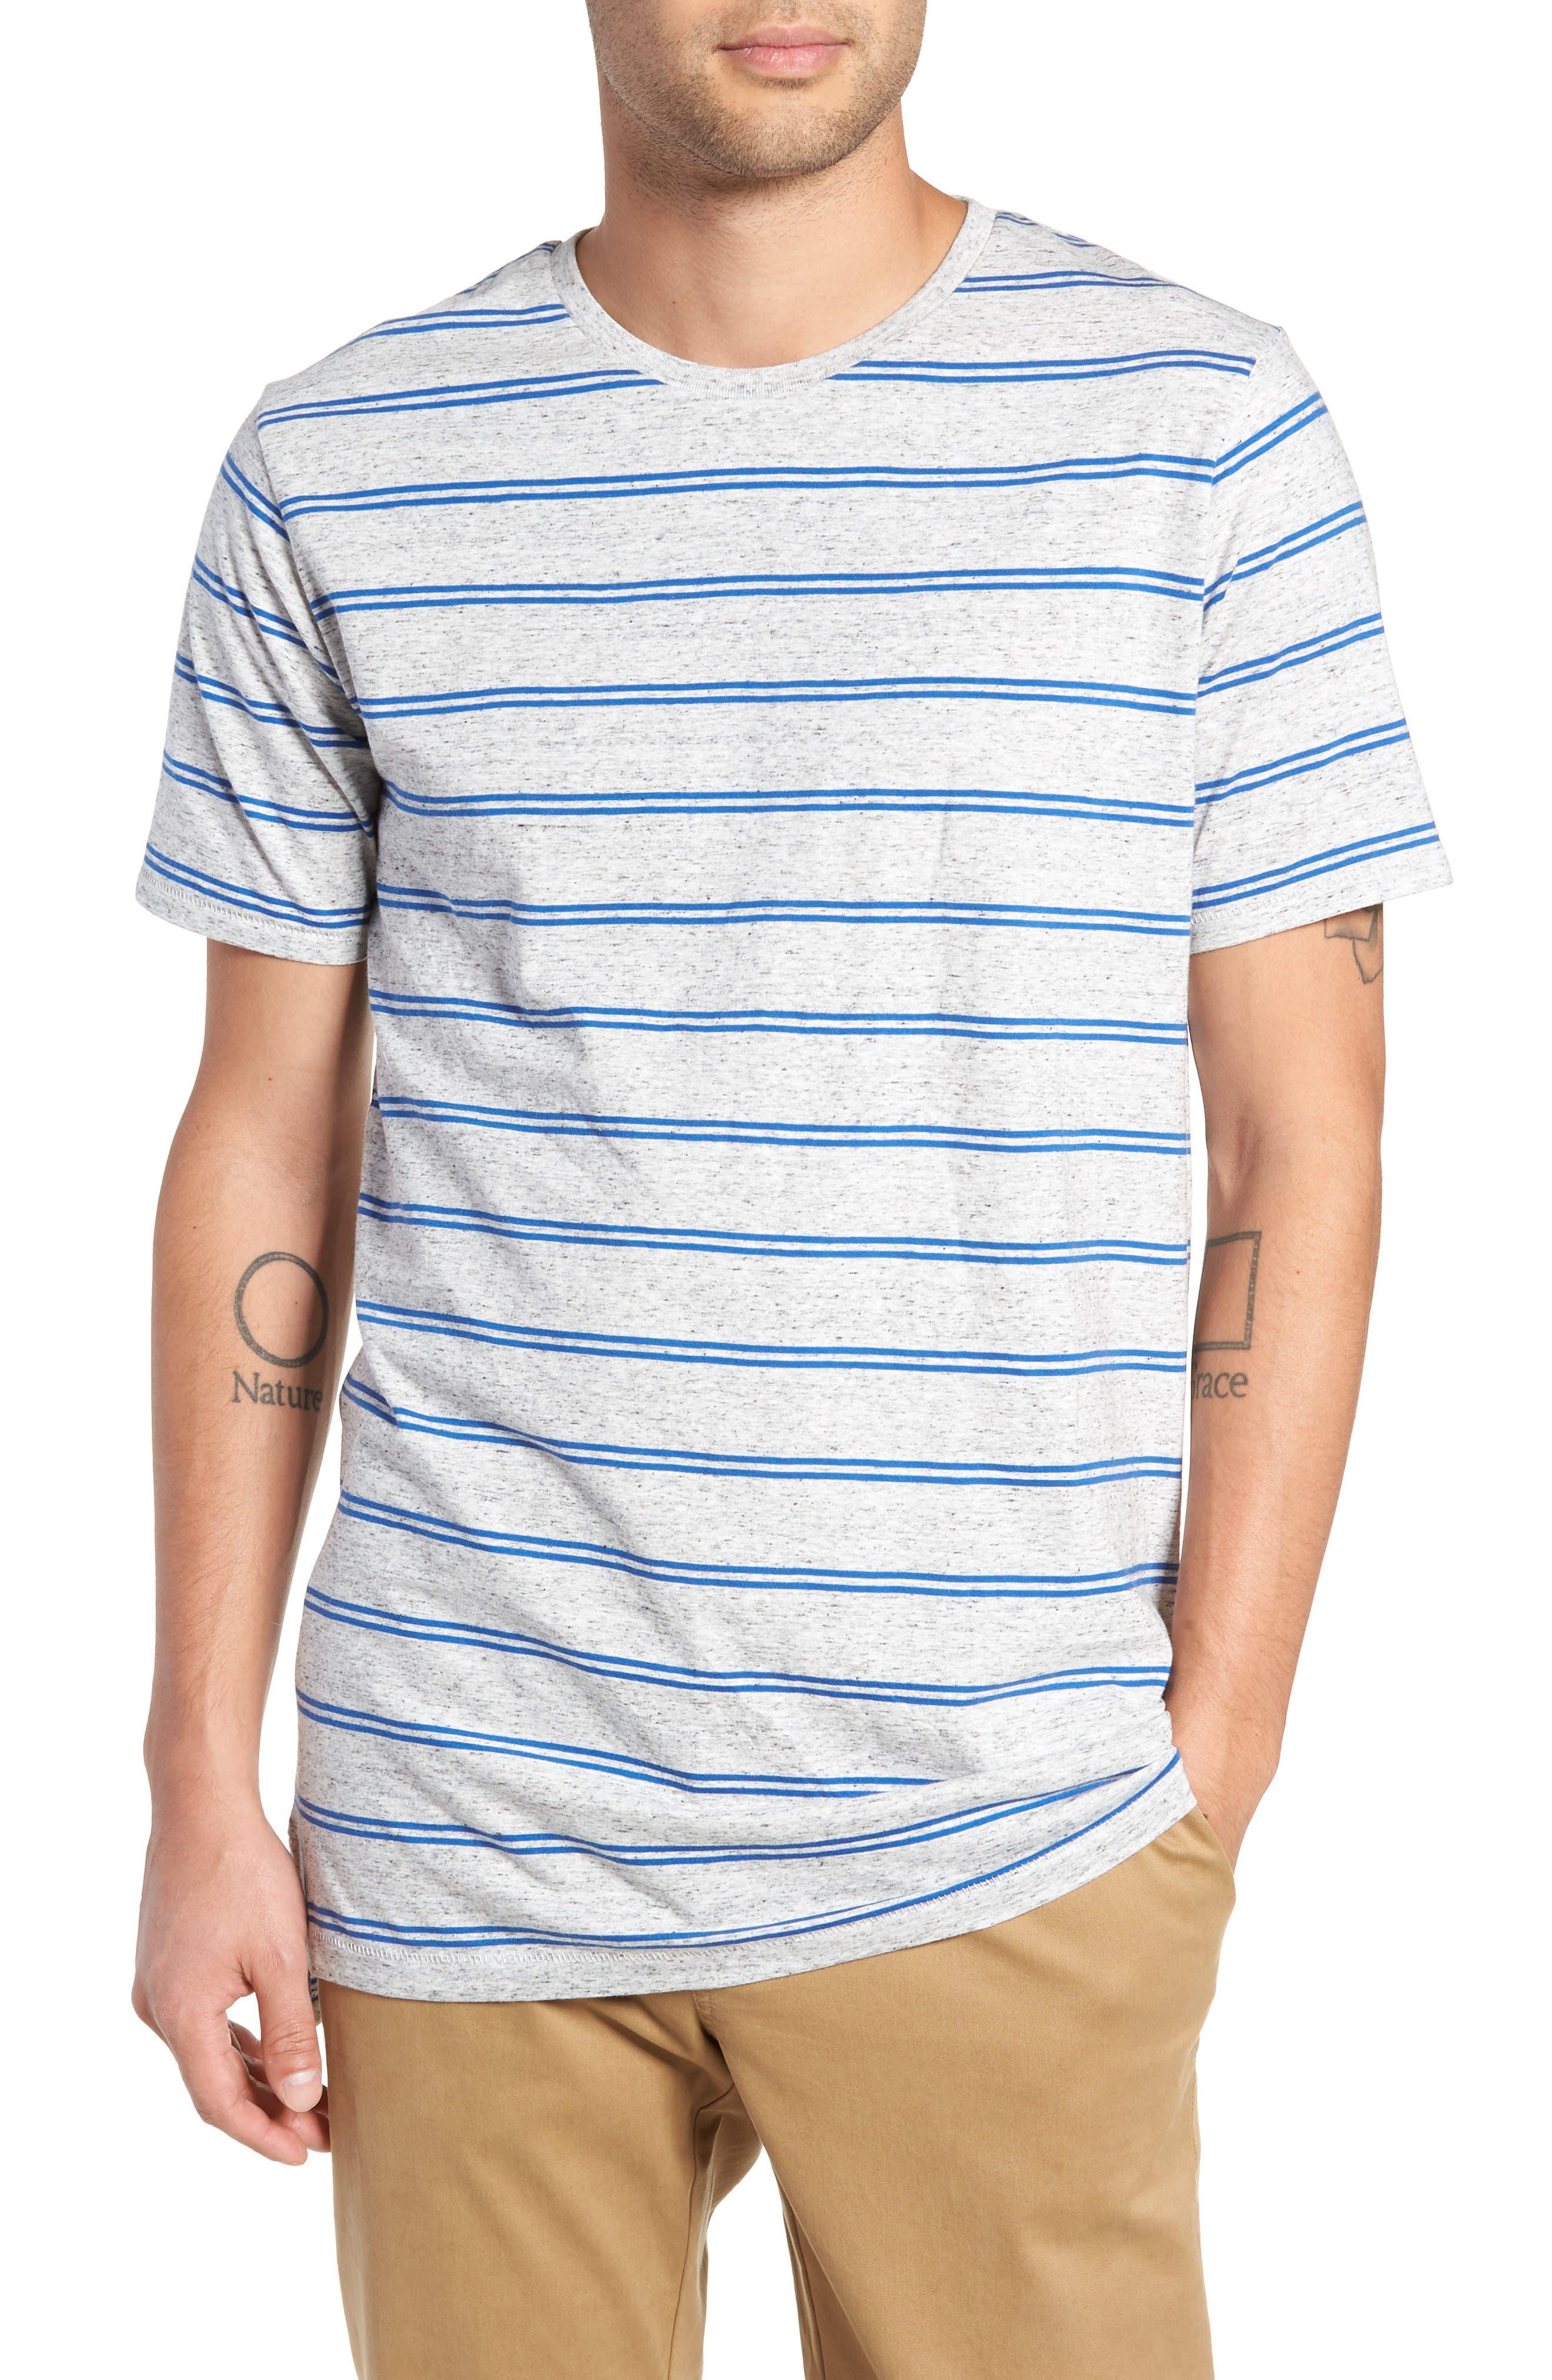 Flintlock T-Shirt,                             Main thumbnail 1, color,                             STORM MARLE/ COBALT